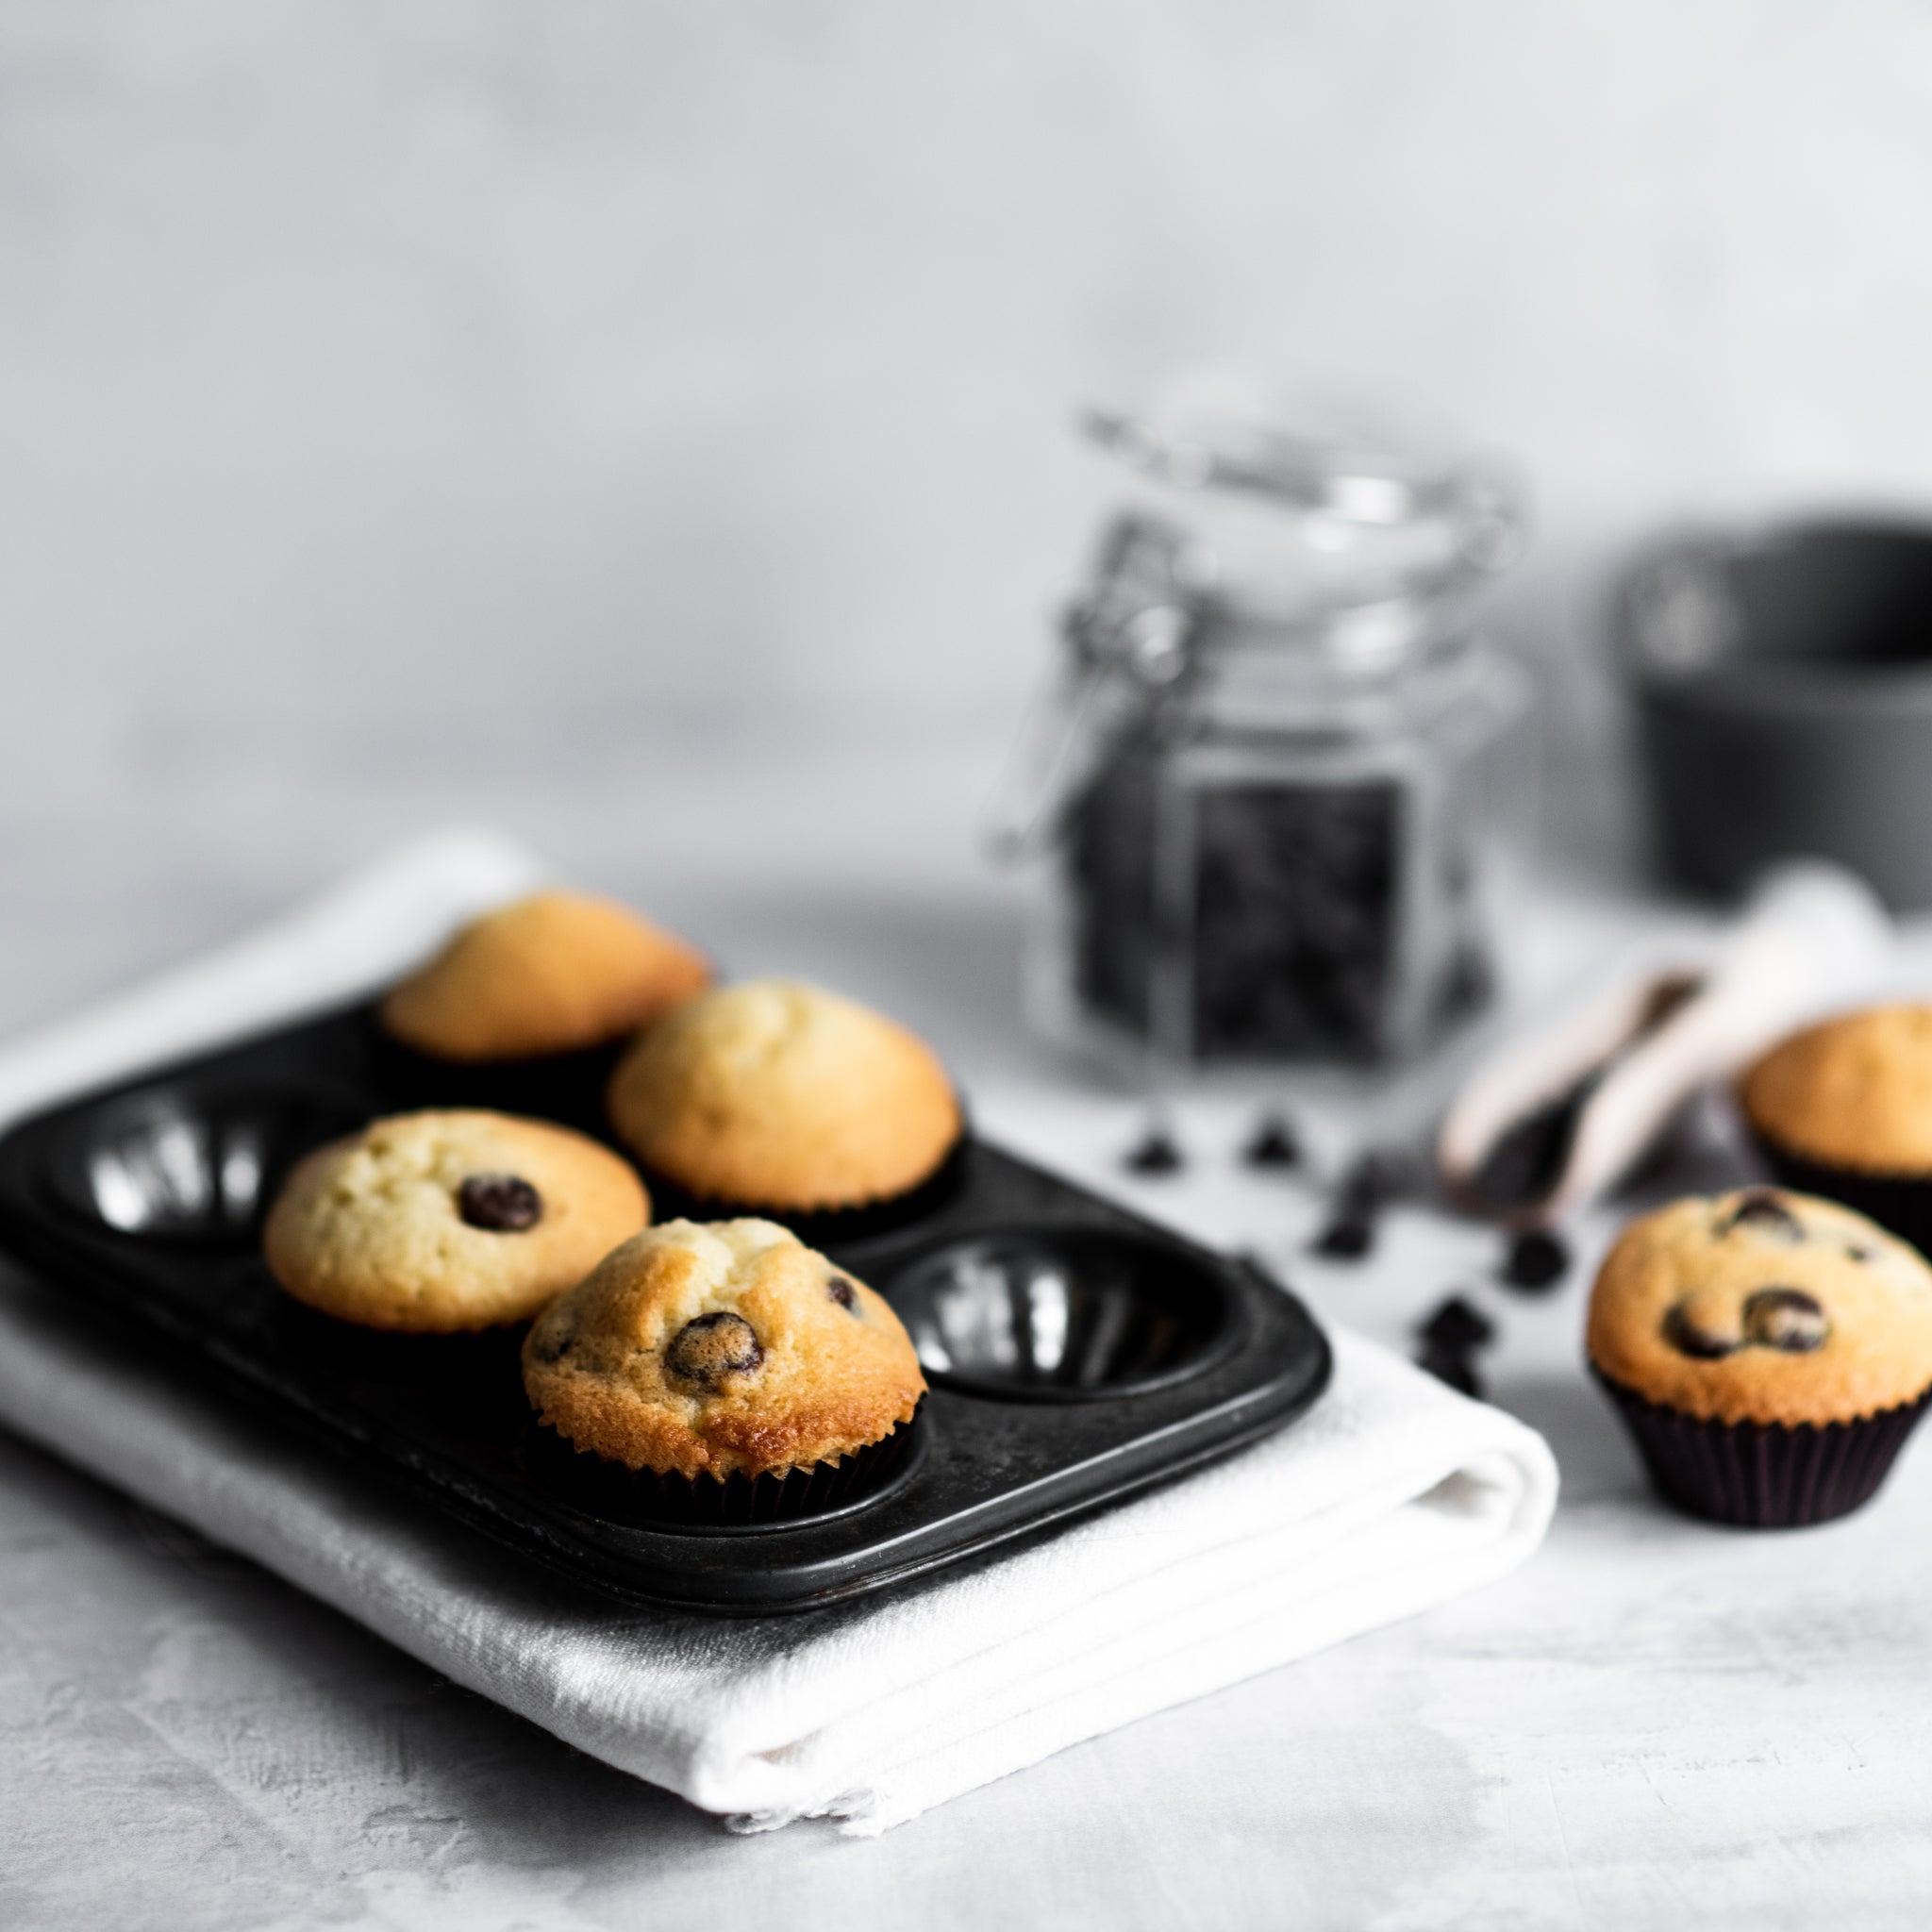 Mini-Chocolate-Chip-Muffins-SQUARE-1.jpg